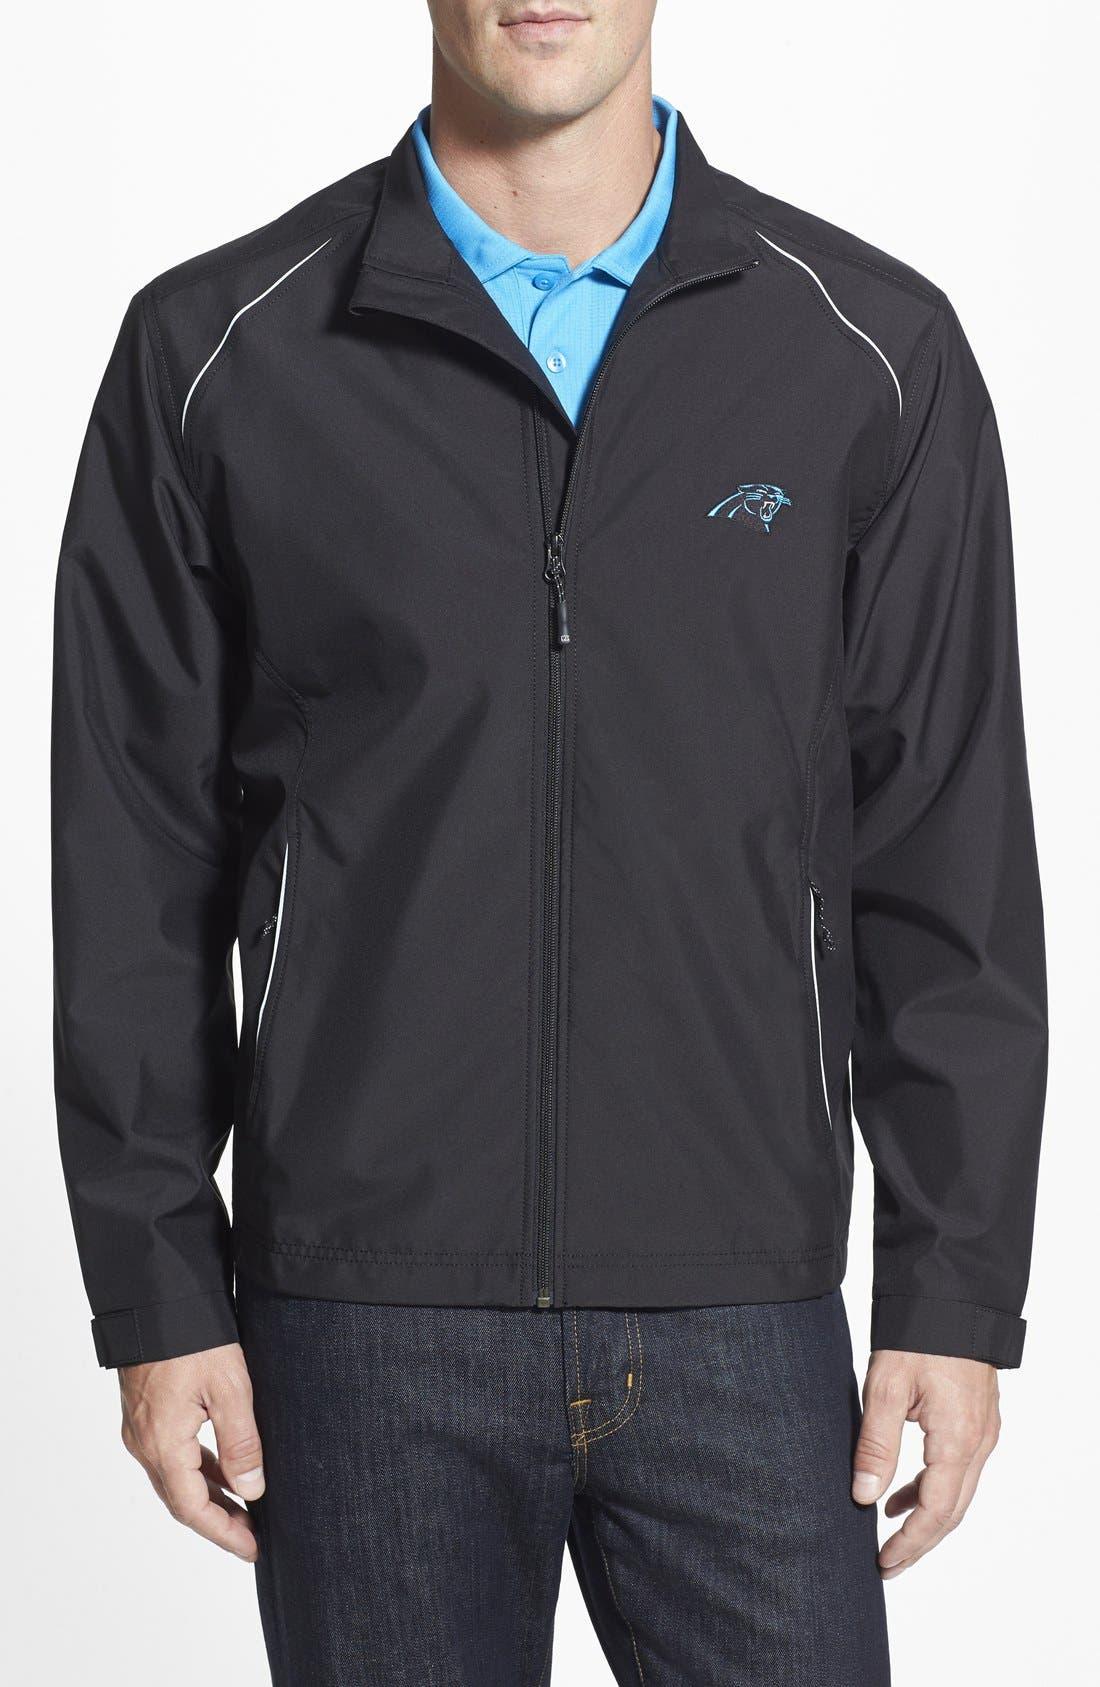 Carolina Panthers - Beacon WeatherTec Wind & Water Resistant Jacket,                             Main thumbnail 1, color,                             Black